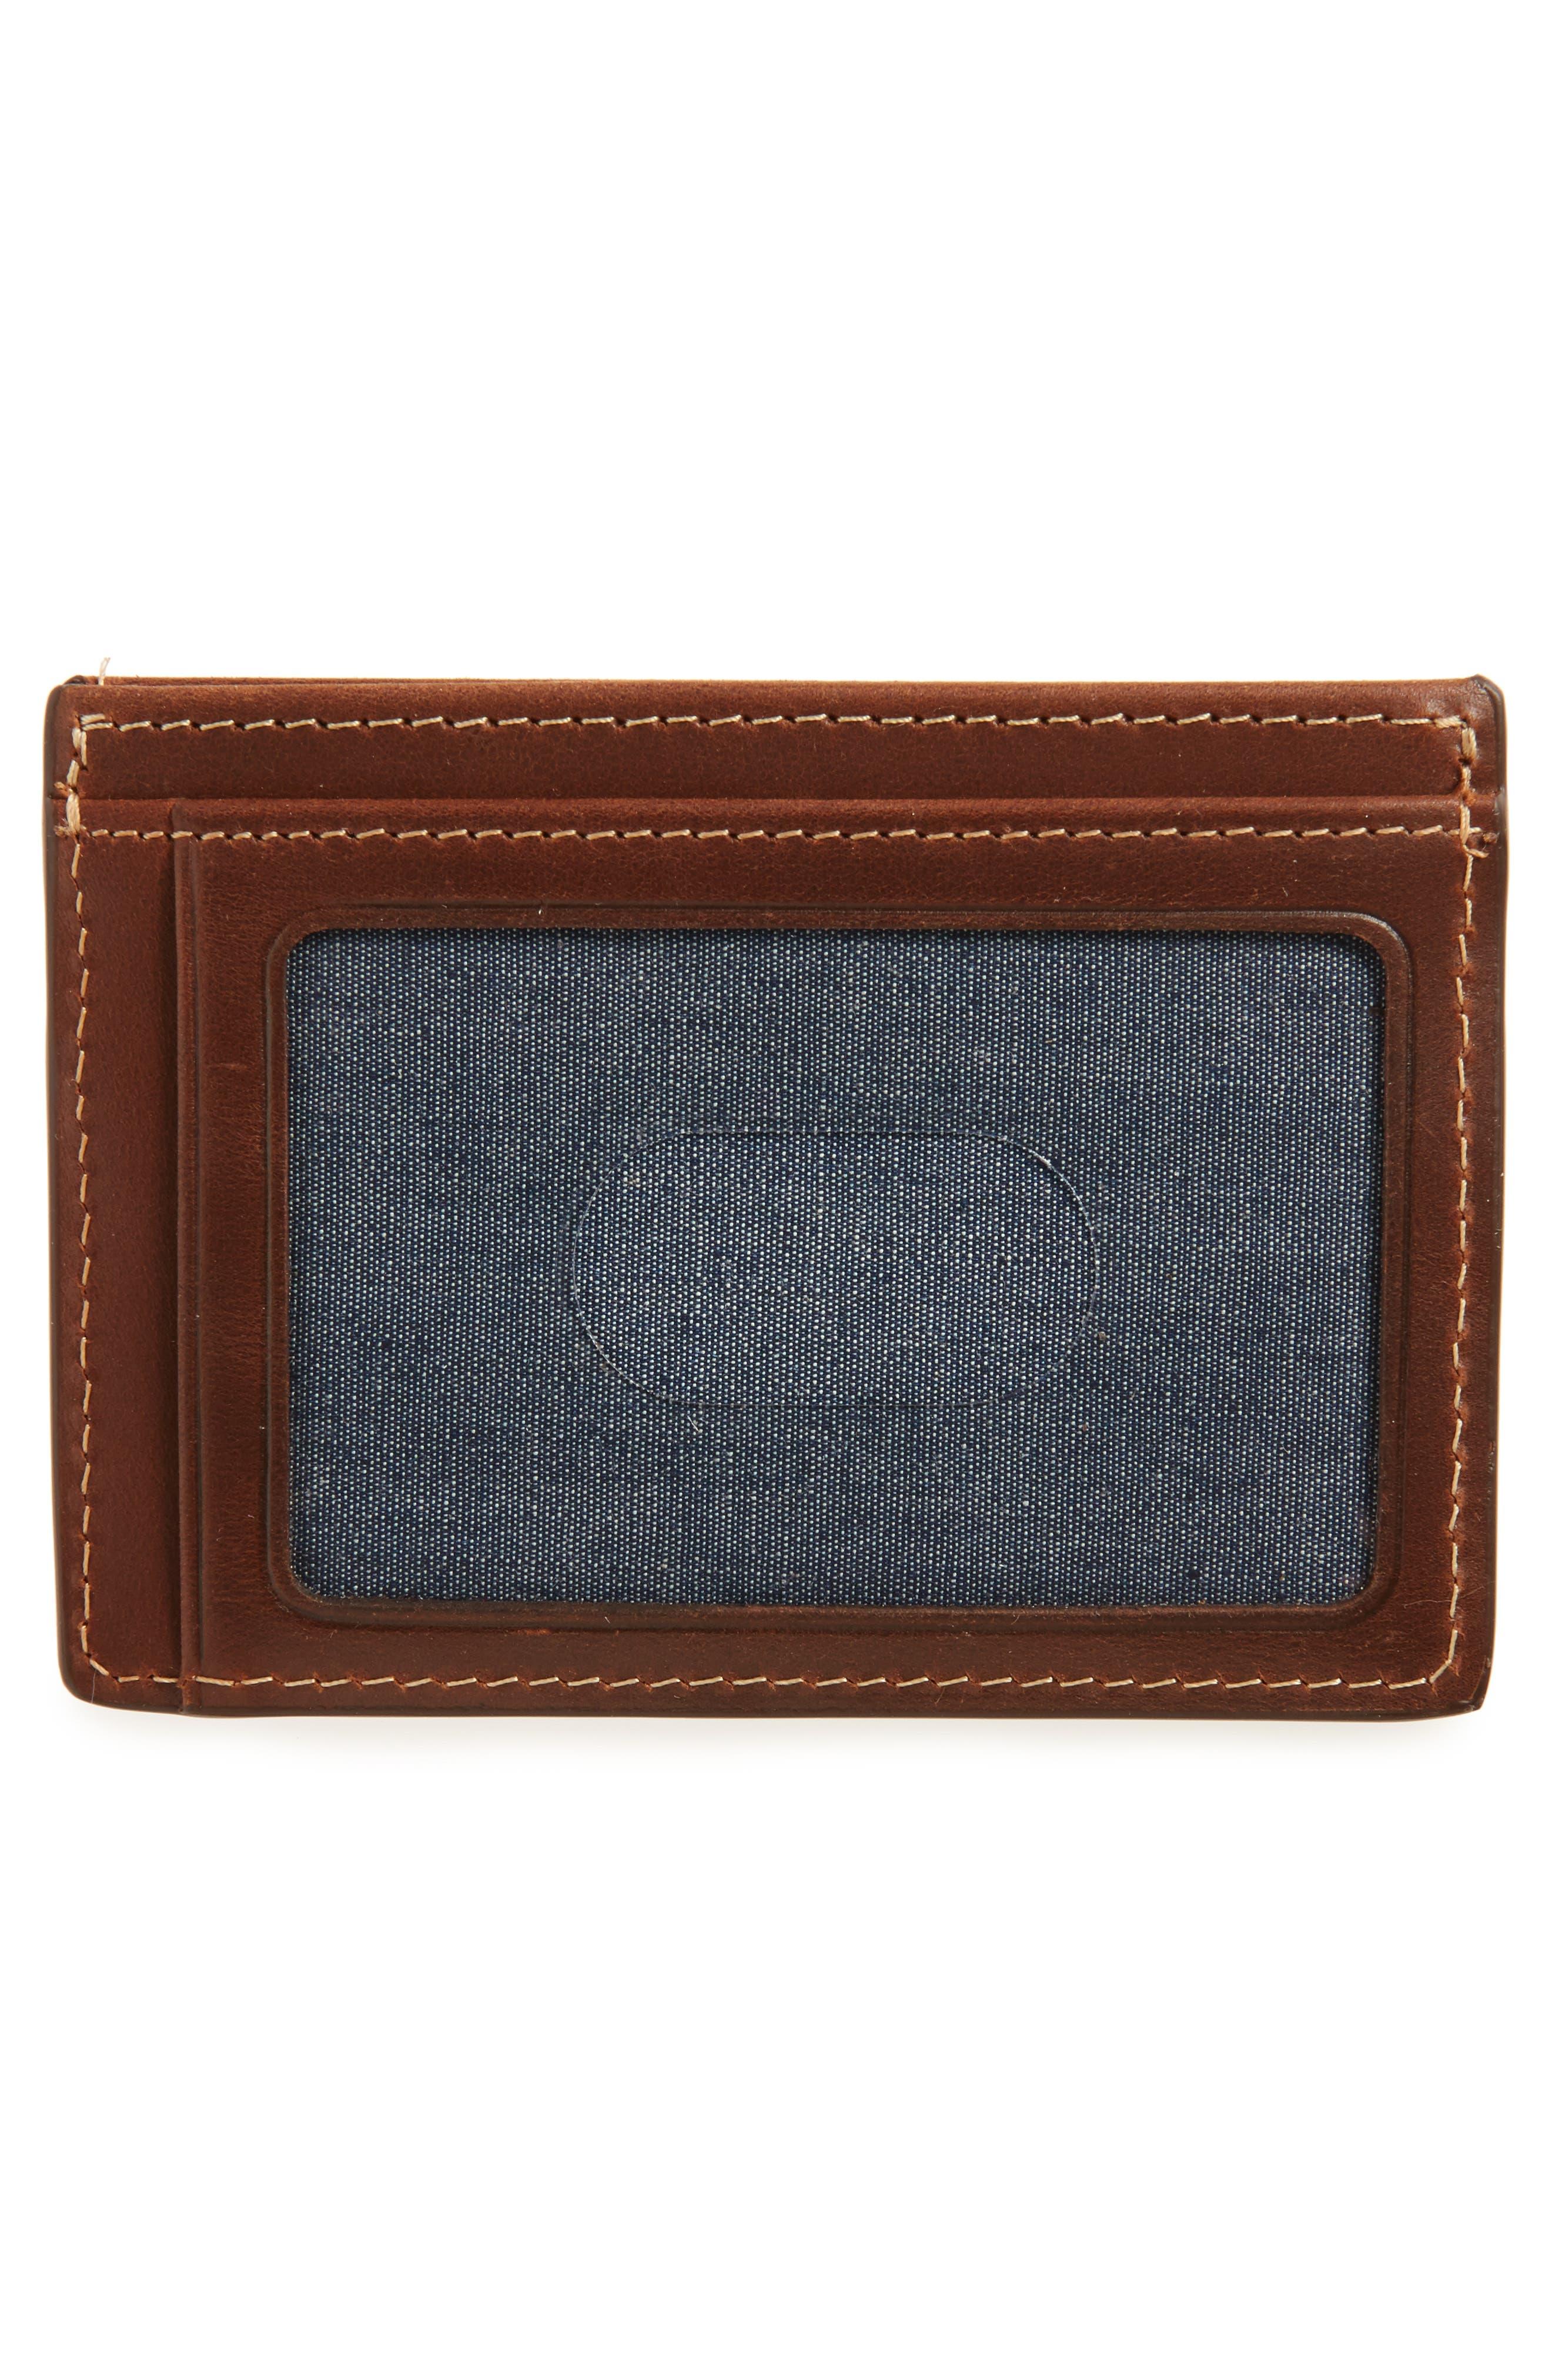 Card Case,                             Alternate thumbnail 2, color,                             Brown Mahogany